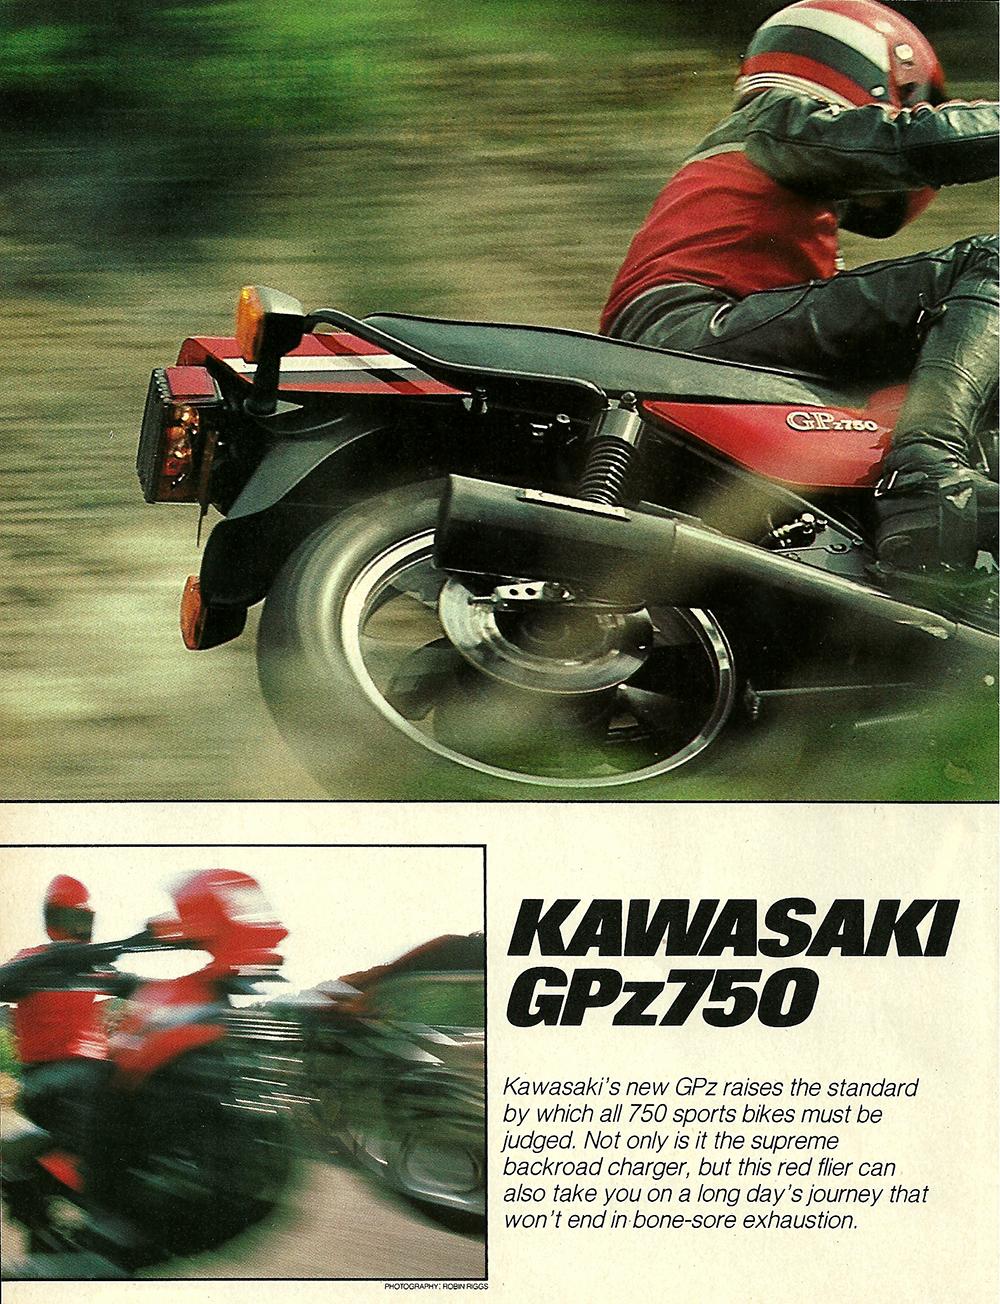 1982 Kawasaki Gpz750 road test 01.jpg